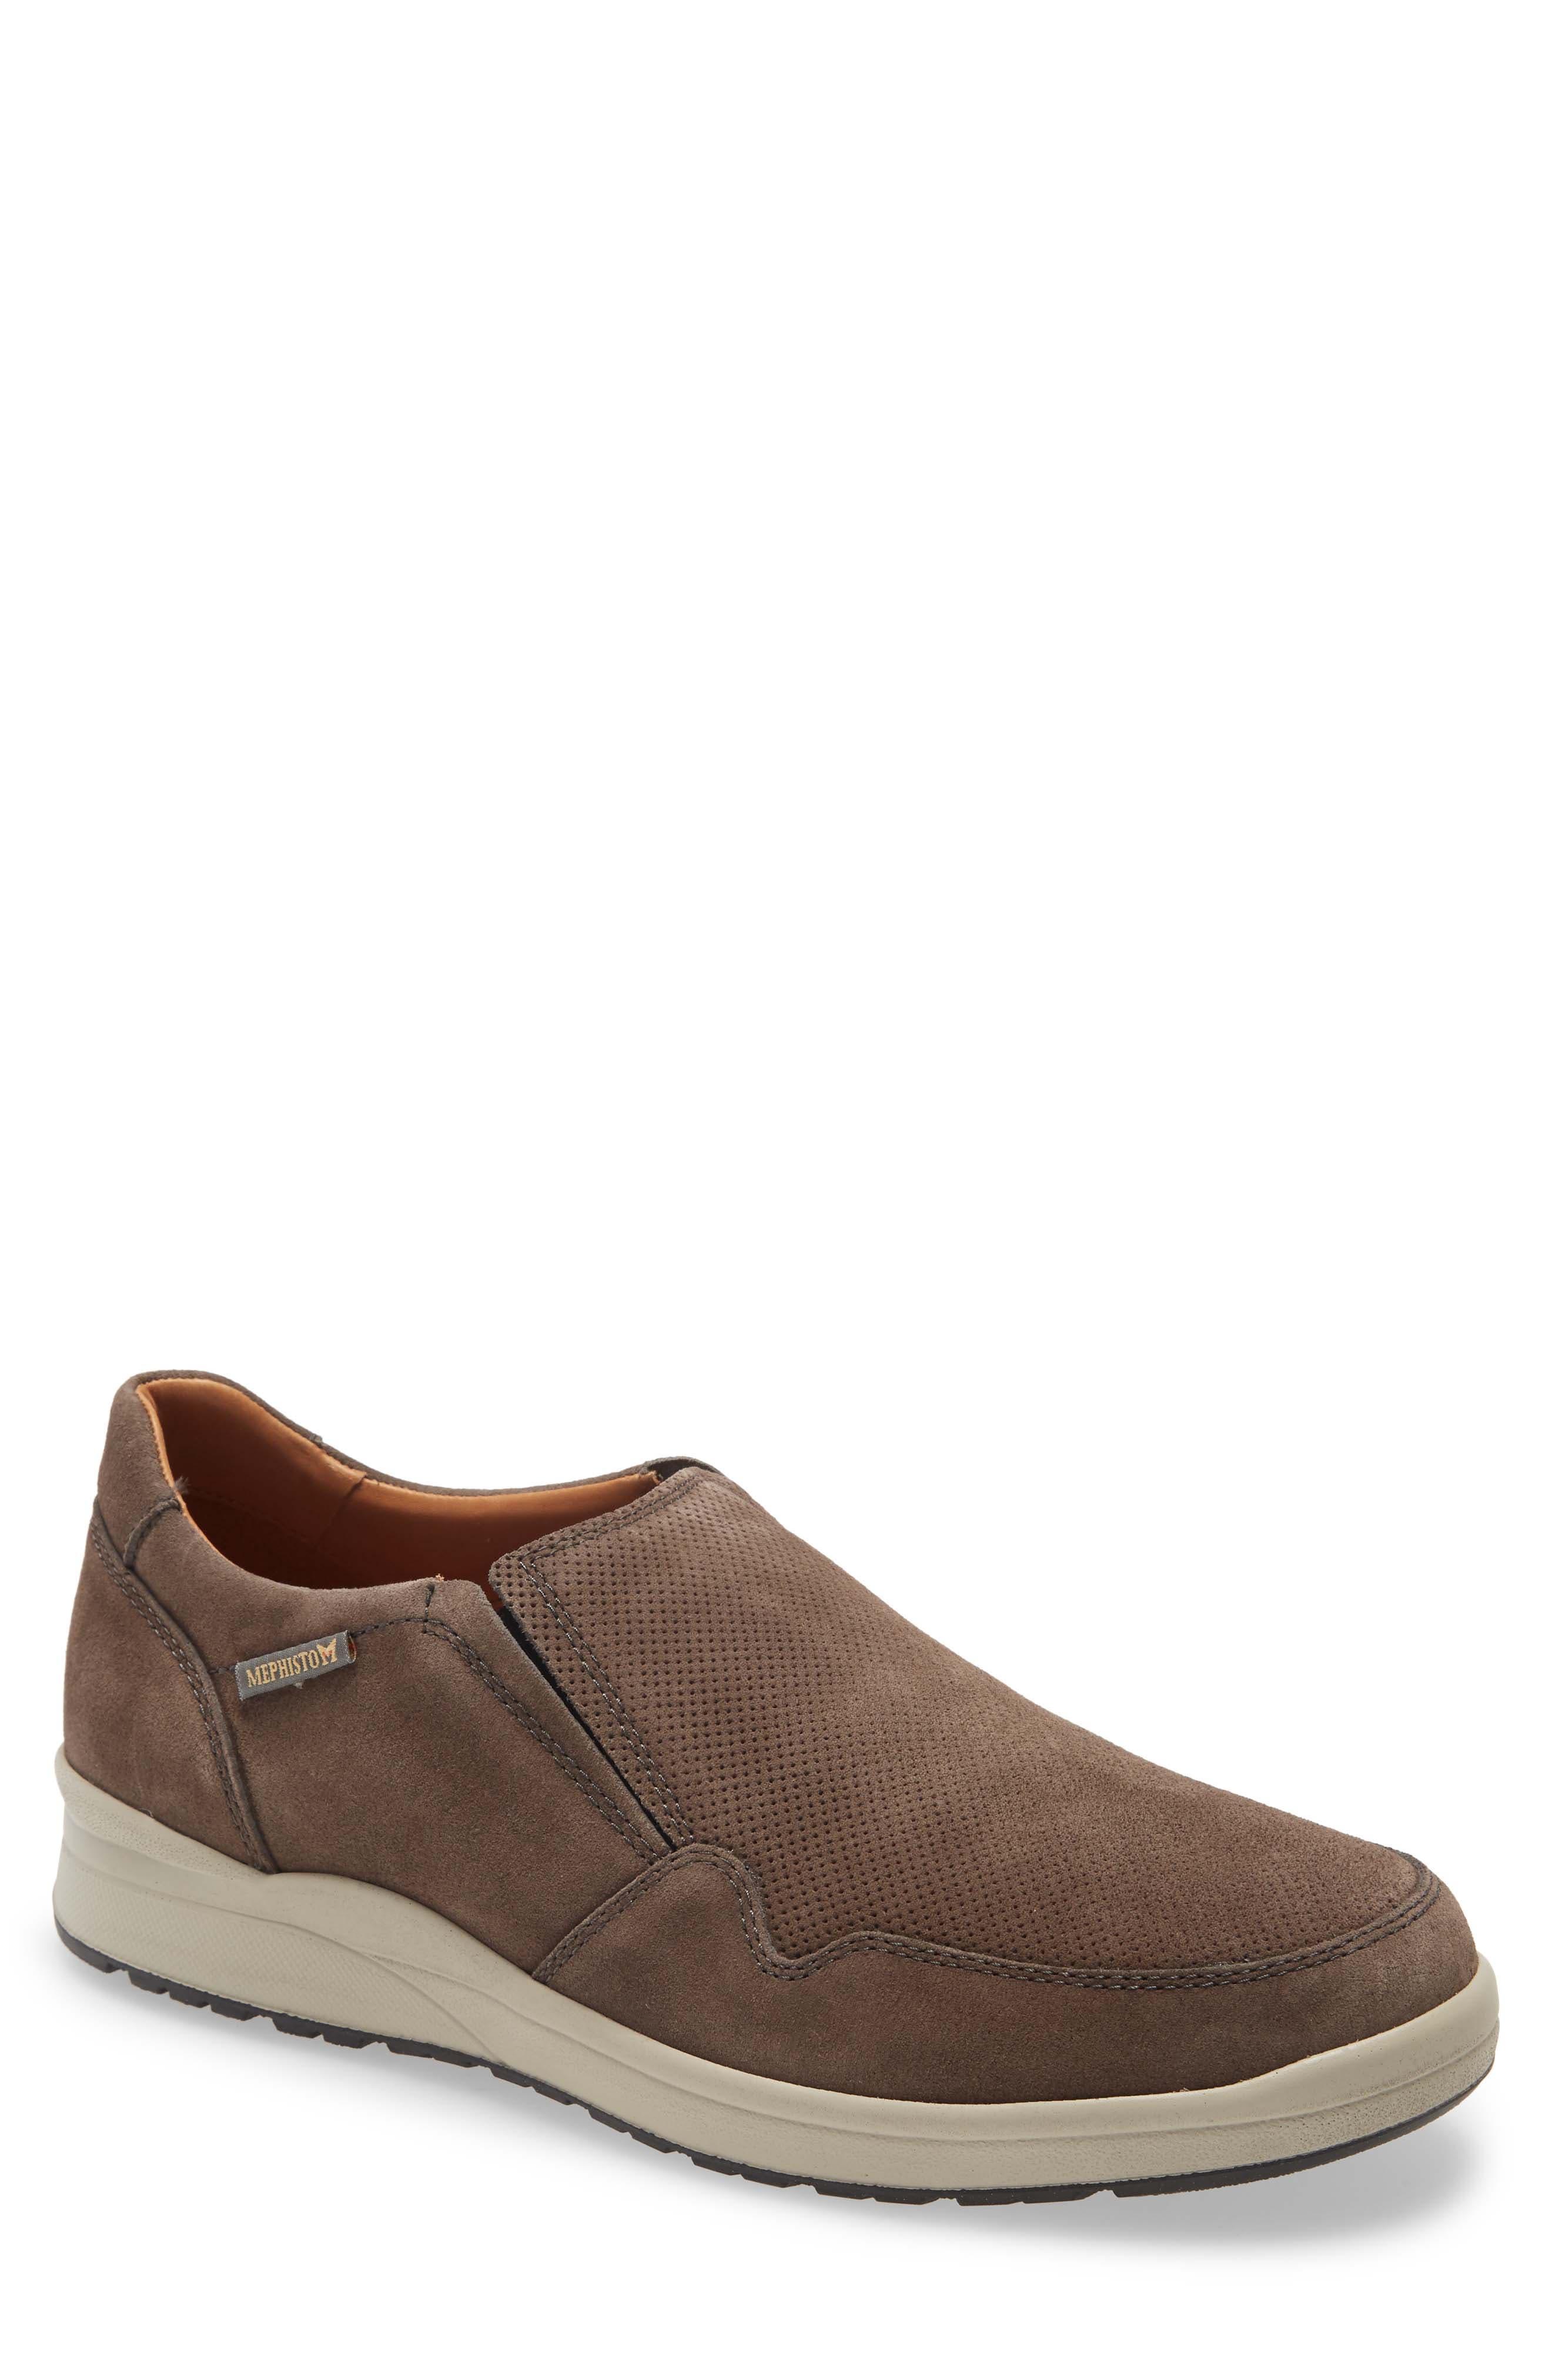 Men's Mephisto Shoes Sale \u0026 Clearance